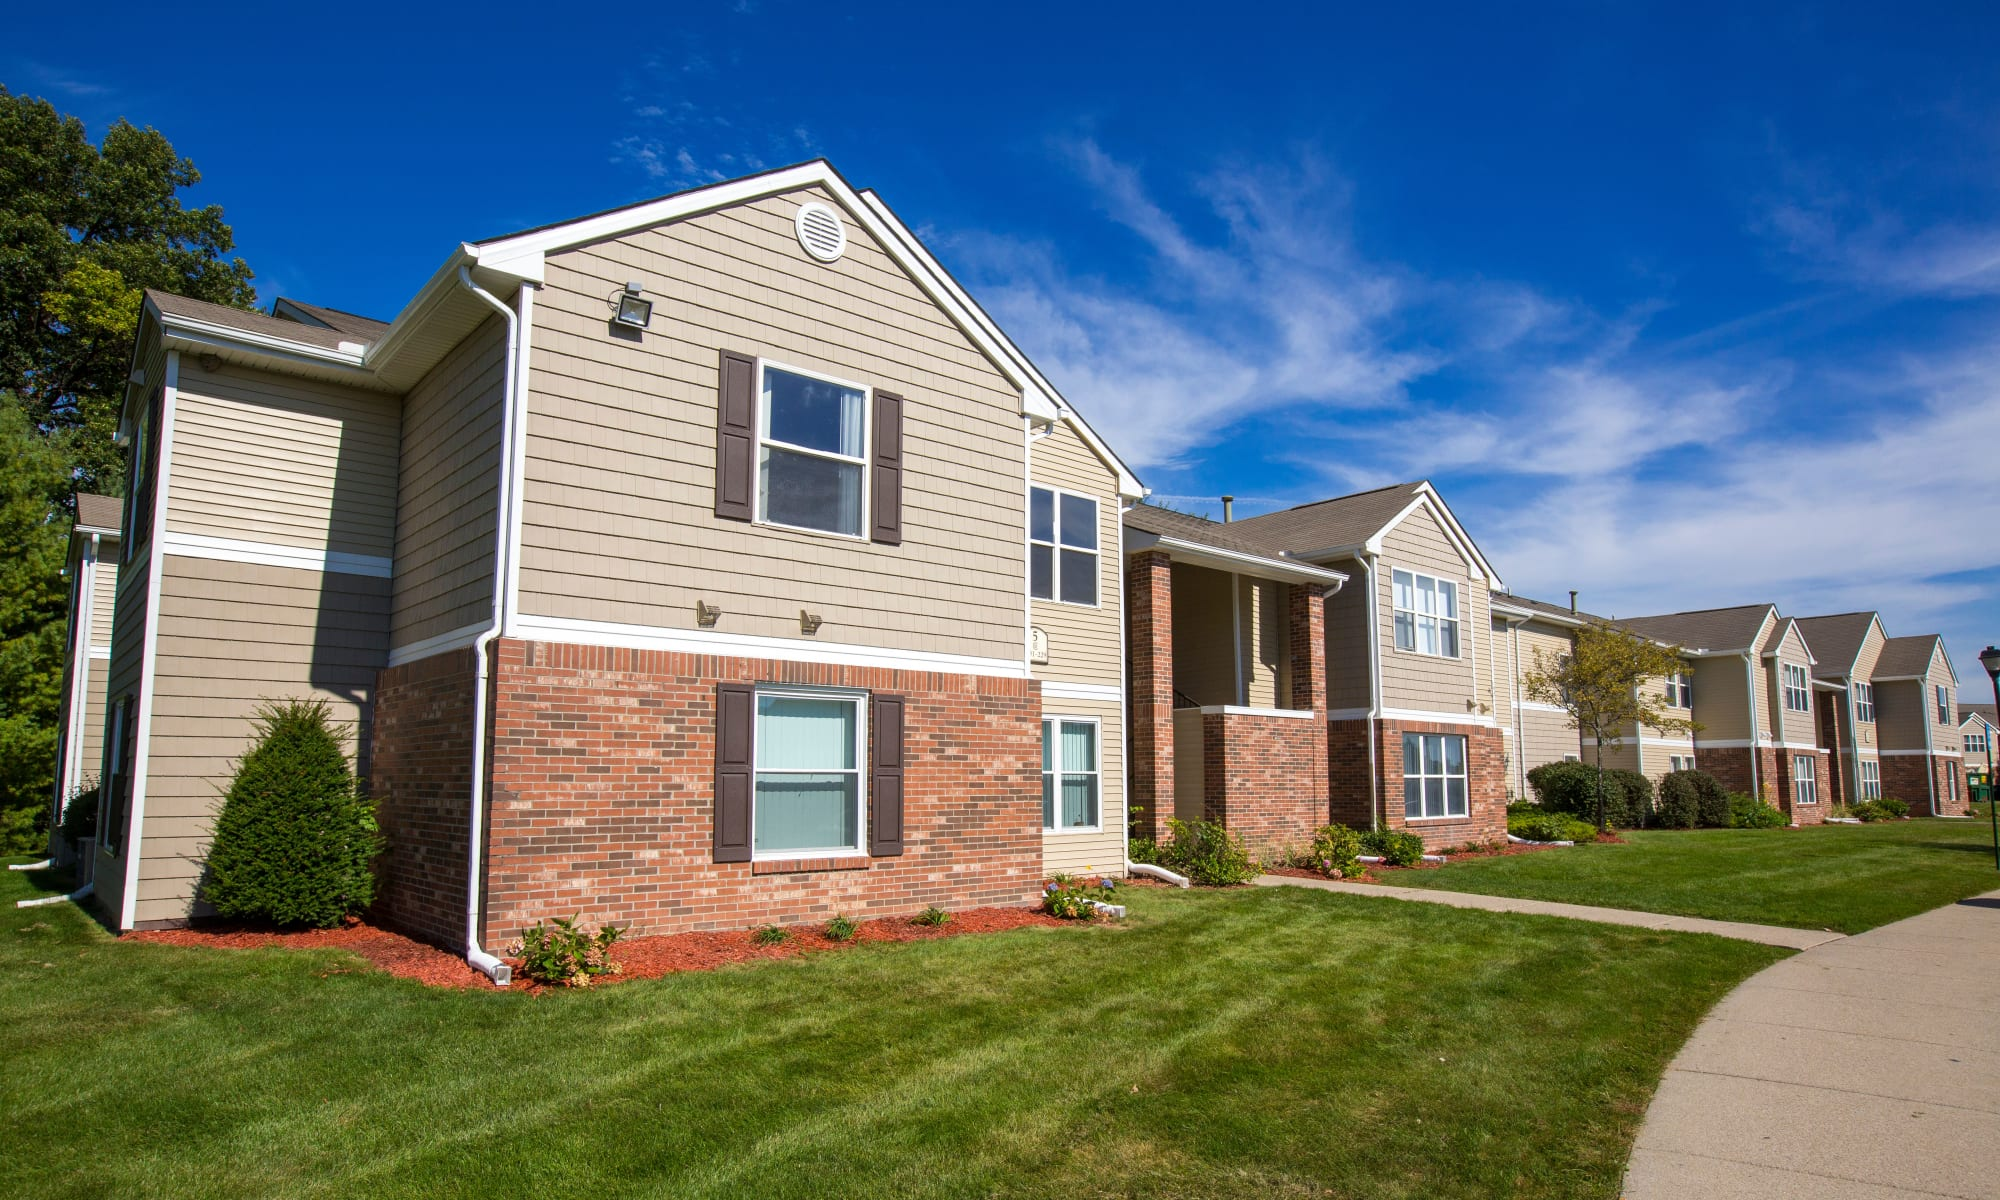 Apartments at The Crossing at Auburn Hills in Pontiac, Michigan